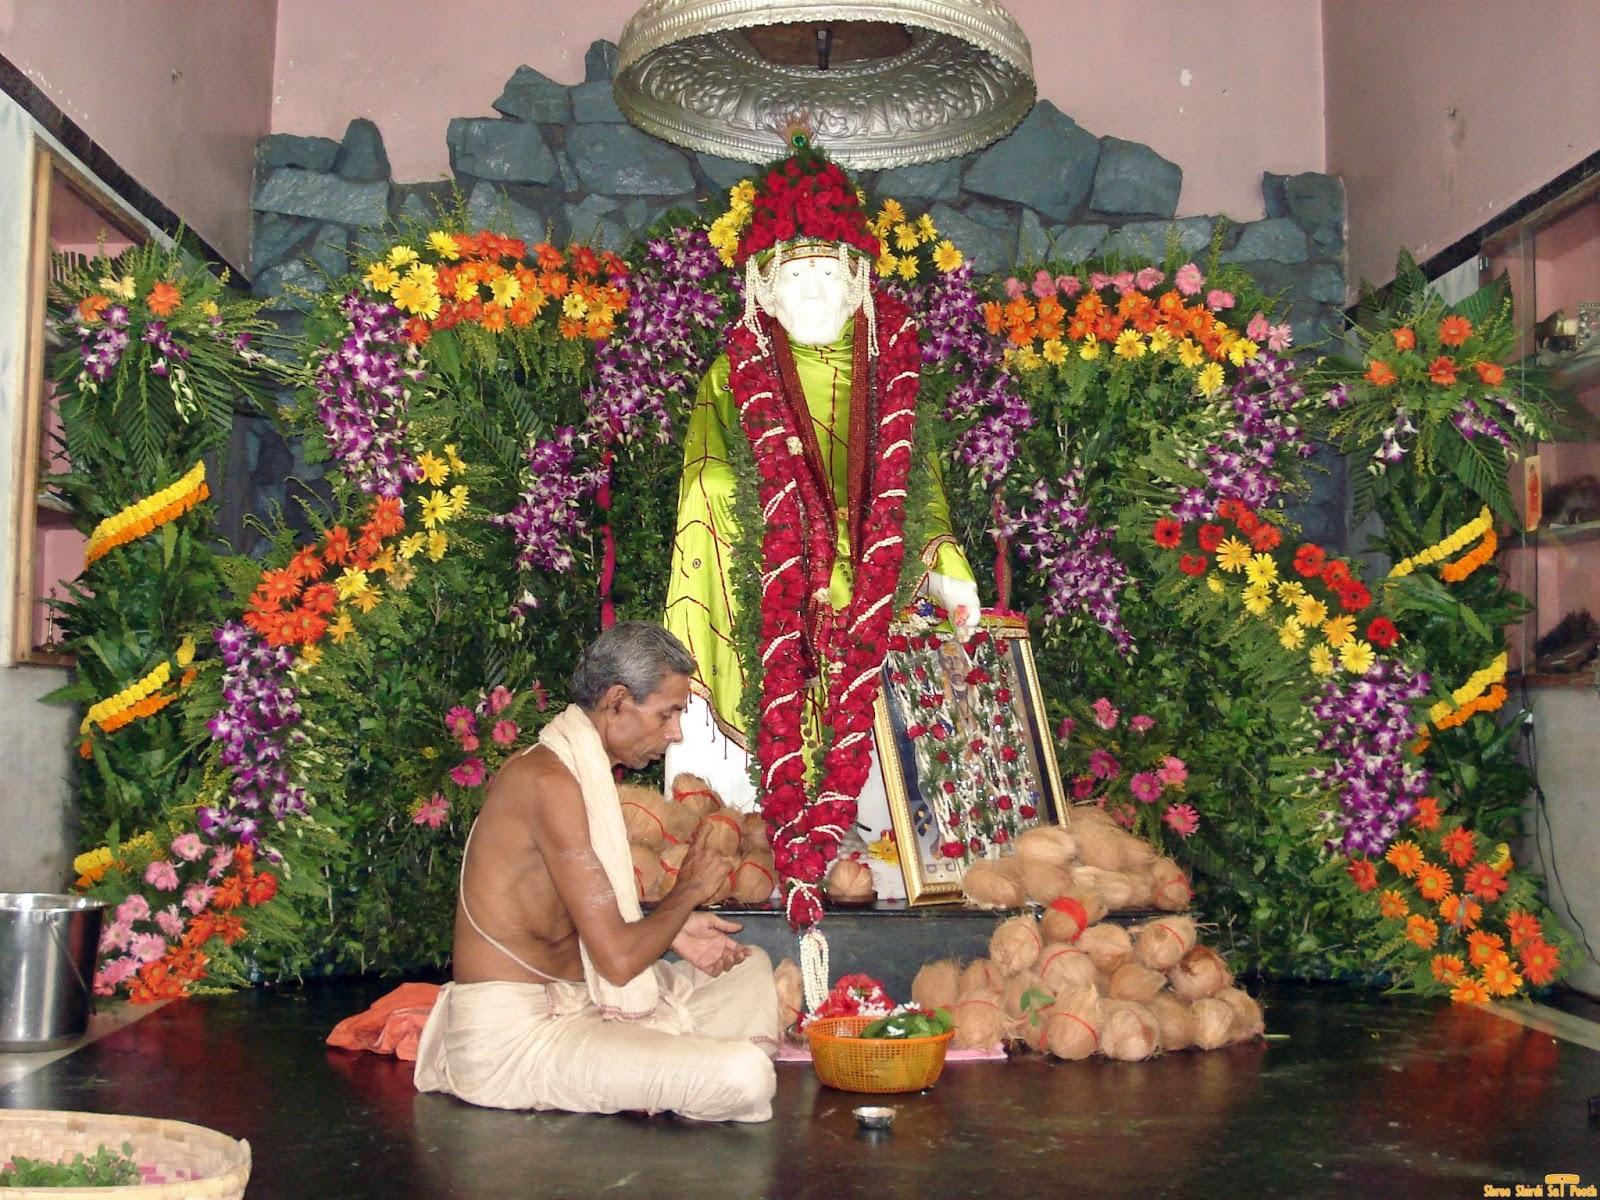 Swami Samarth Wallpaper 3d Sai Baba Hd Wallpapers Free Download Fine Hd Wallpapers